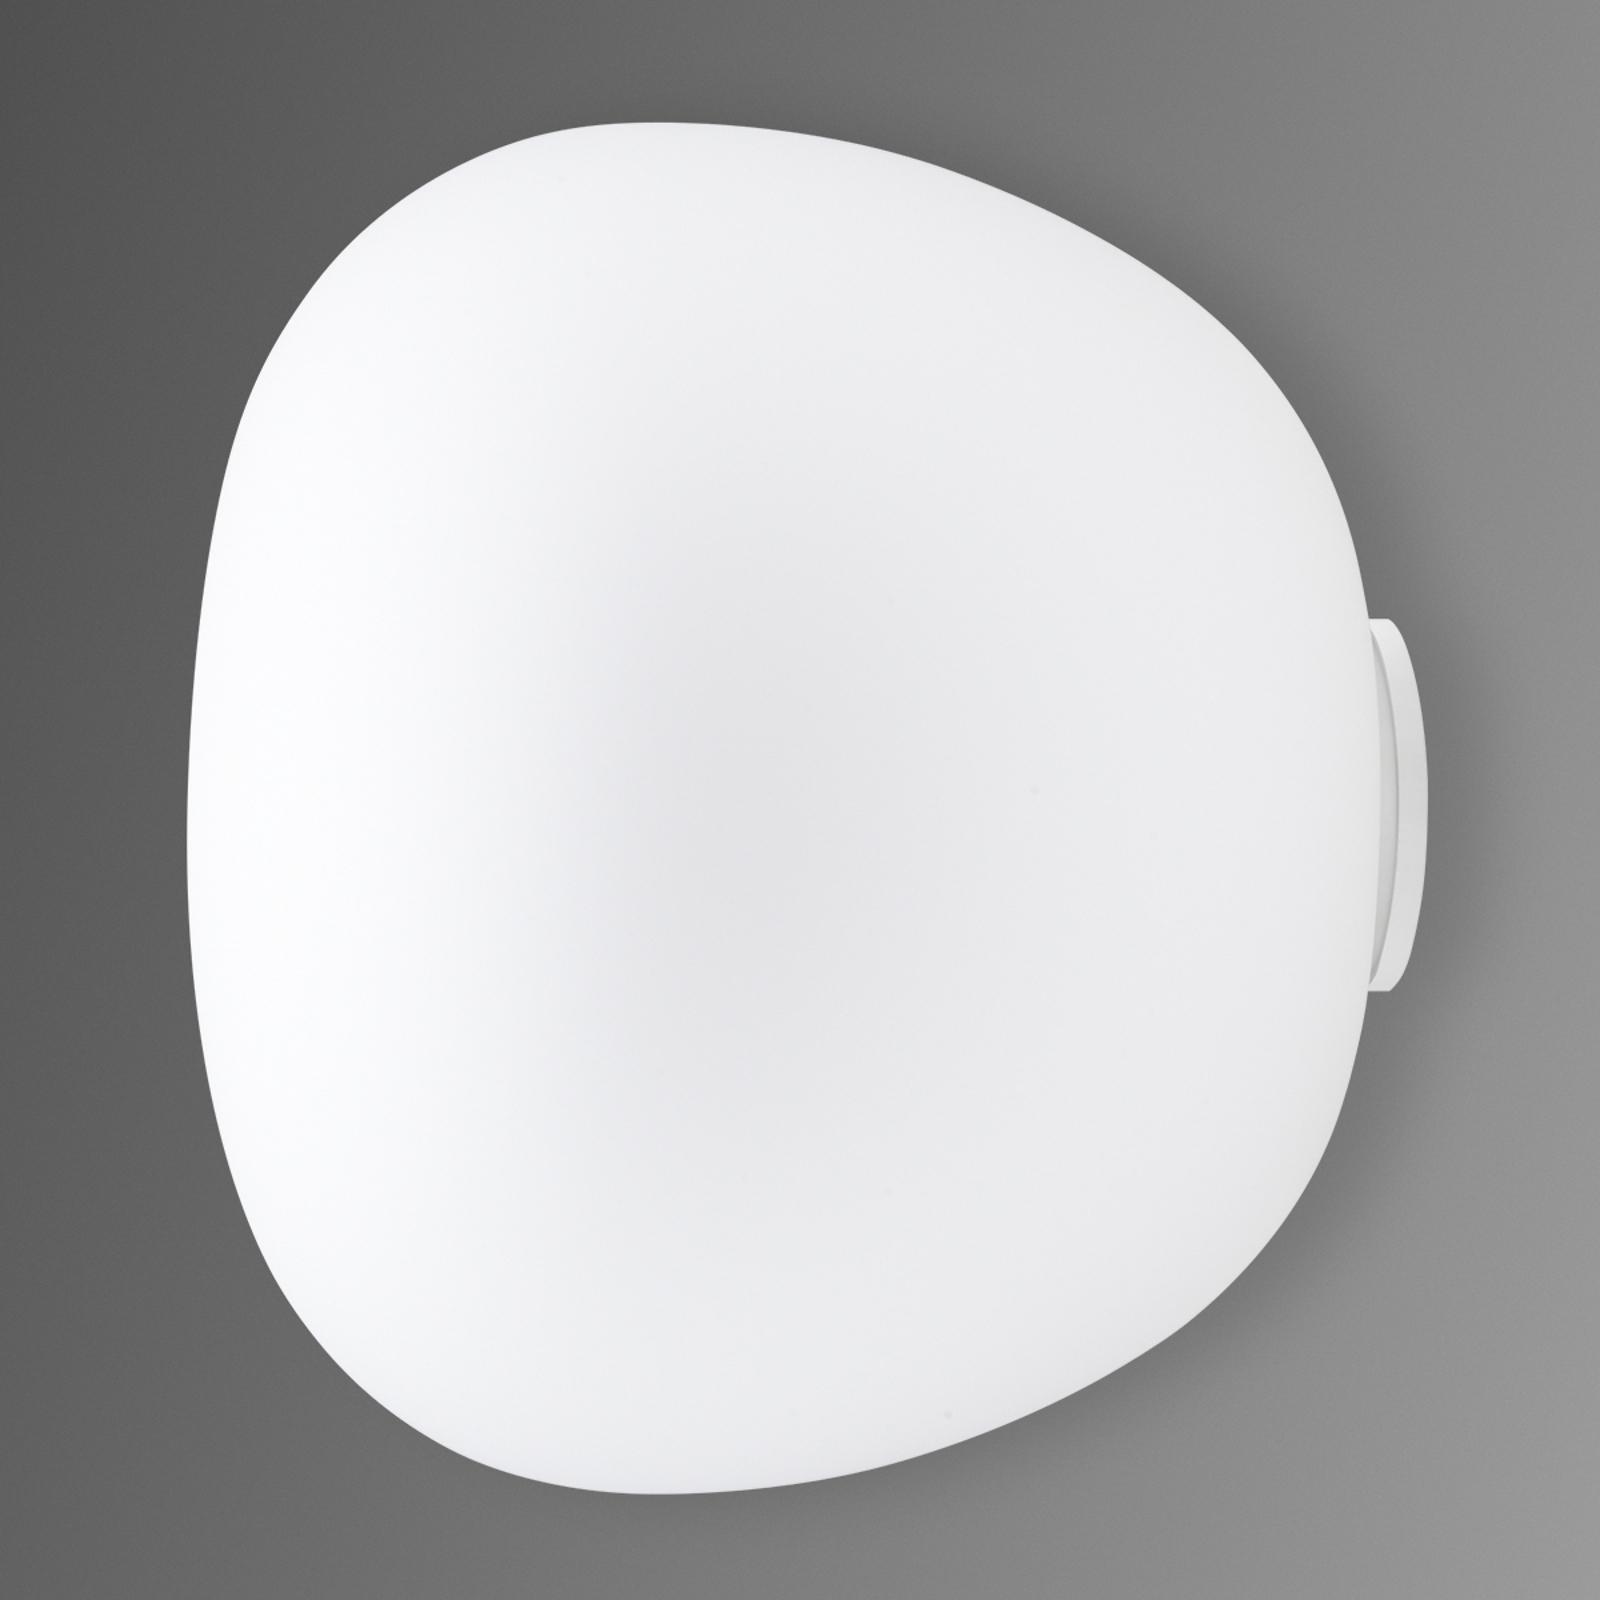 Doskonała lampa sufitowa MOCHI 20 cm